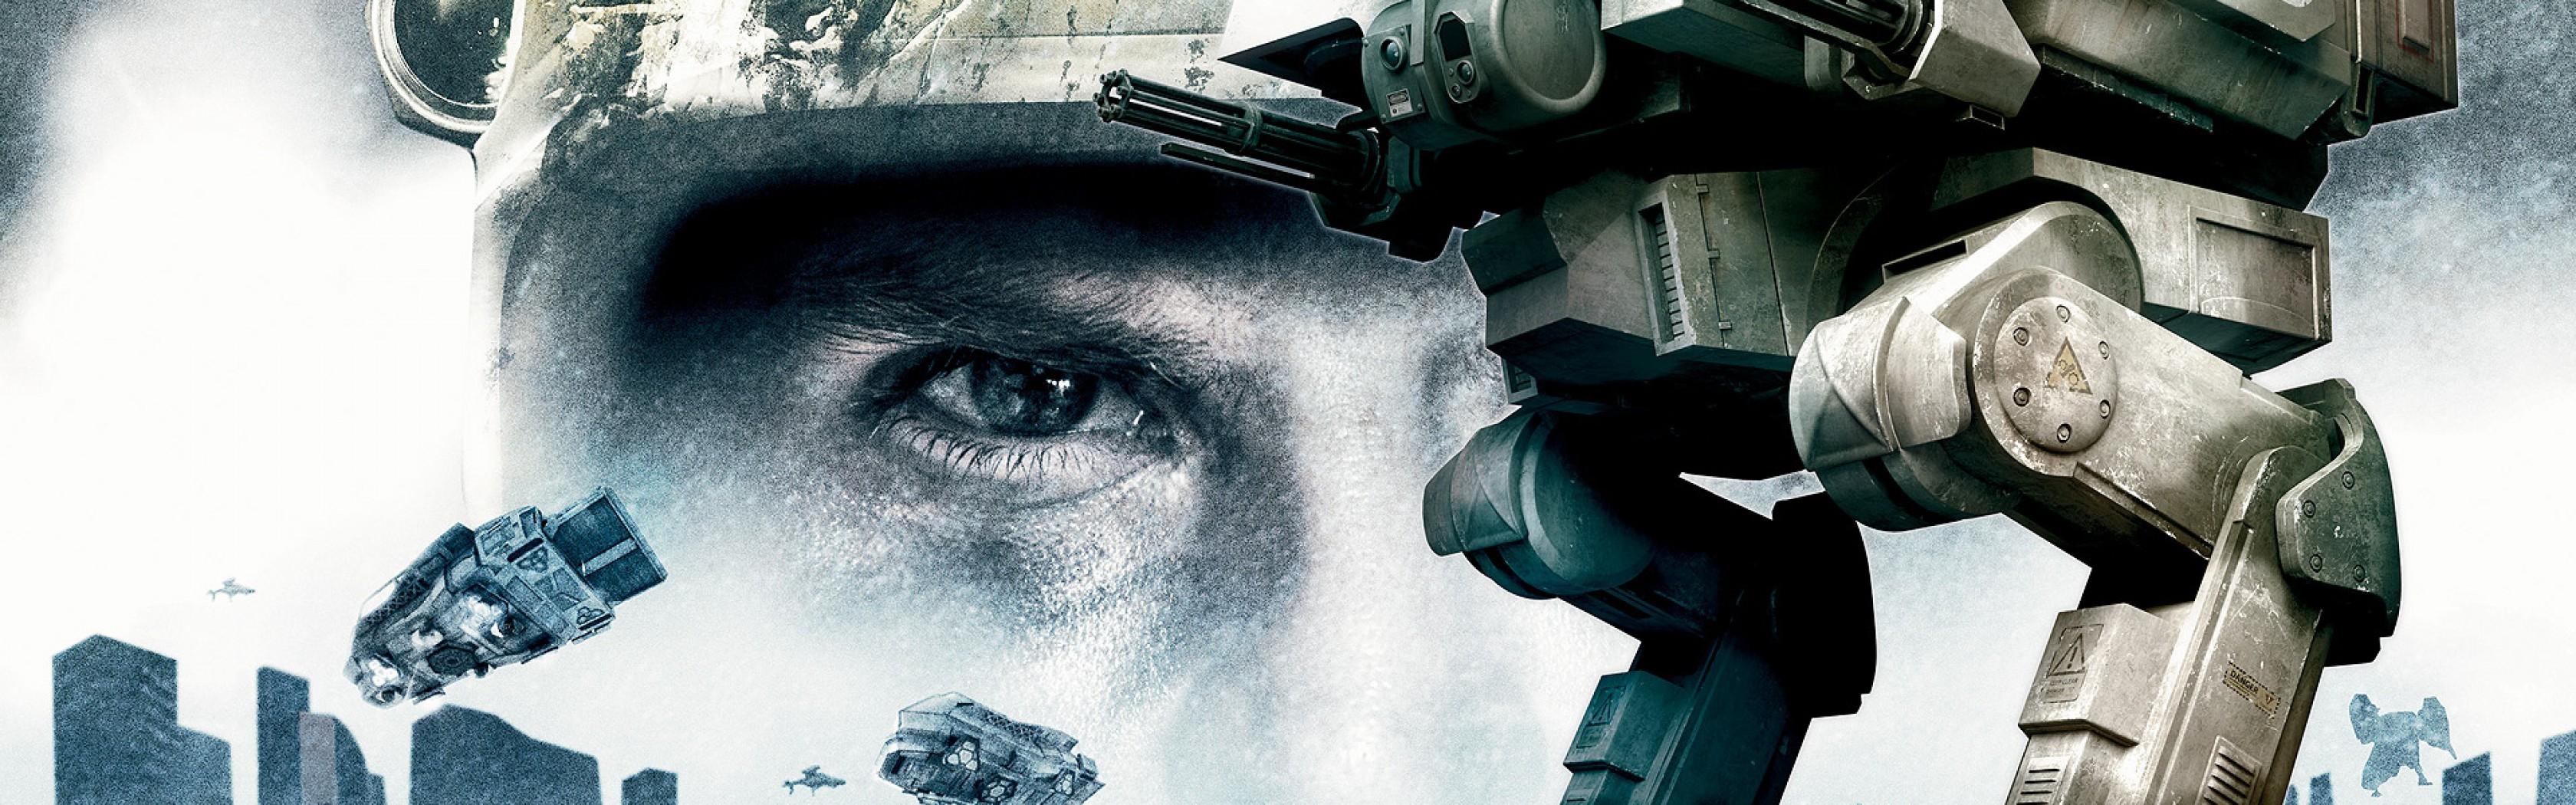 Wallpaper Battlefield 2142 Battlefield Bad Company 2 Ea Games